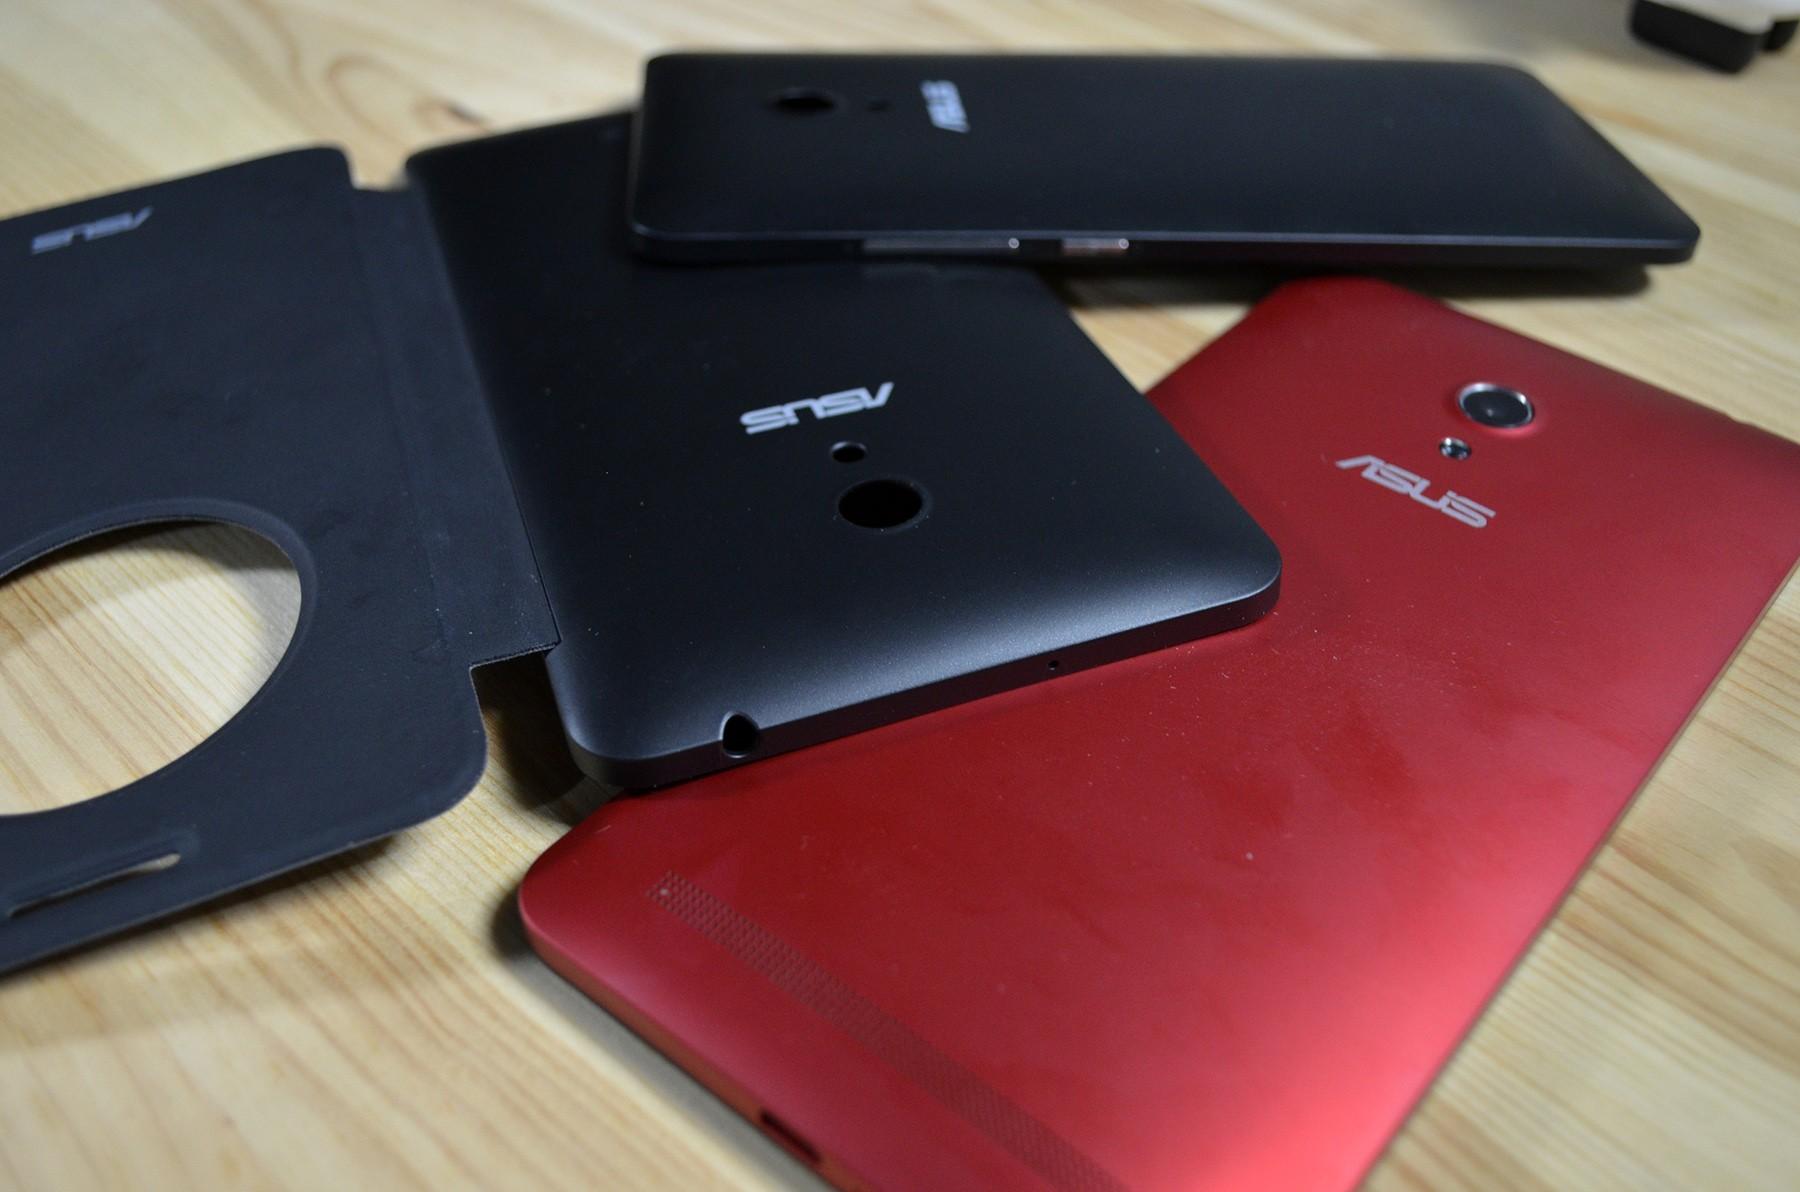 asus zenfone 55 inch - Asus đang phát triển Zenfone 5,5 inch